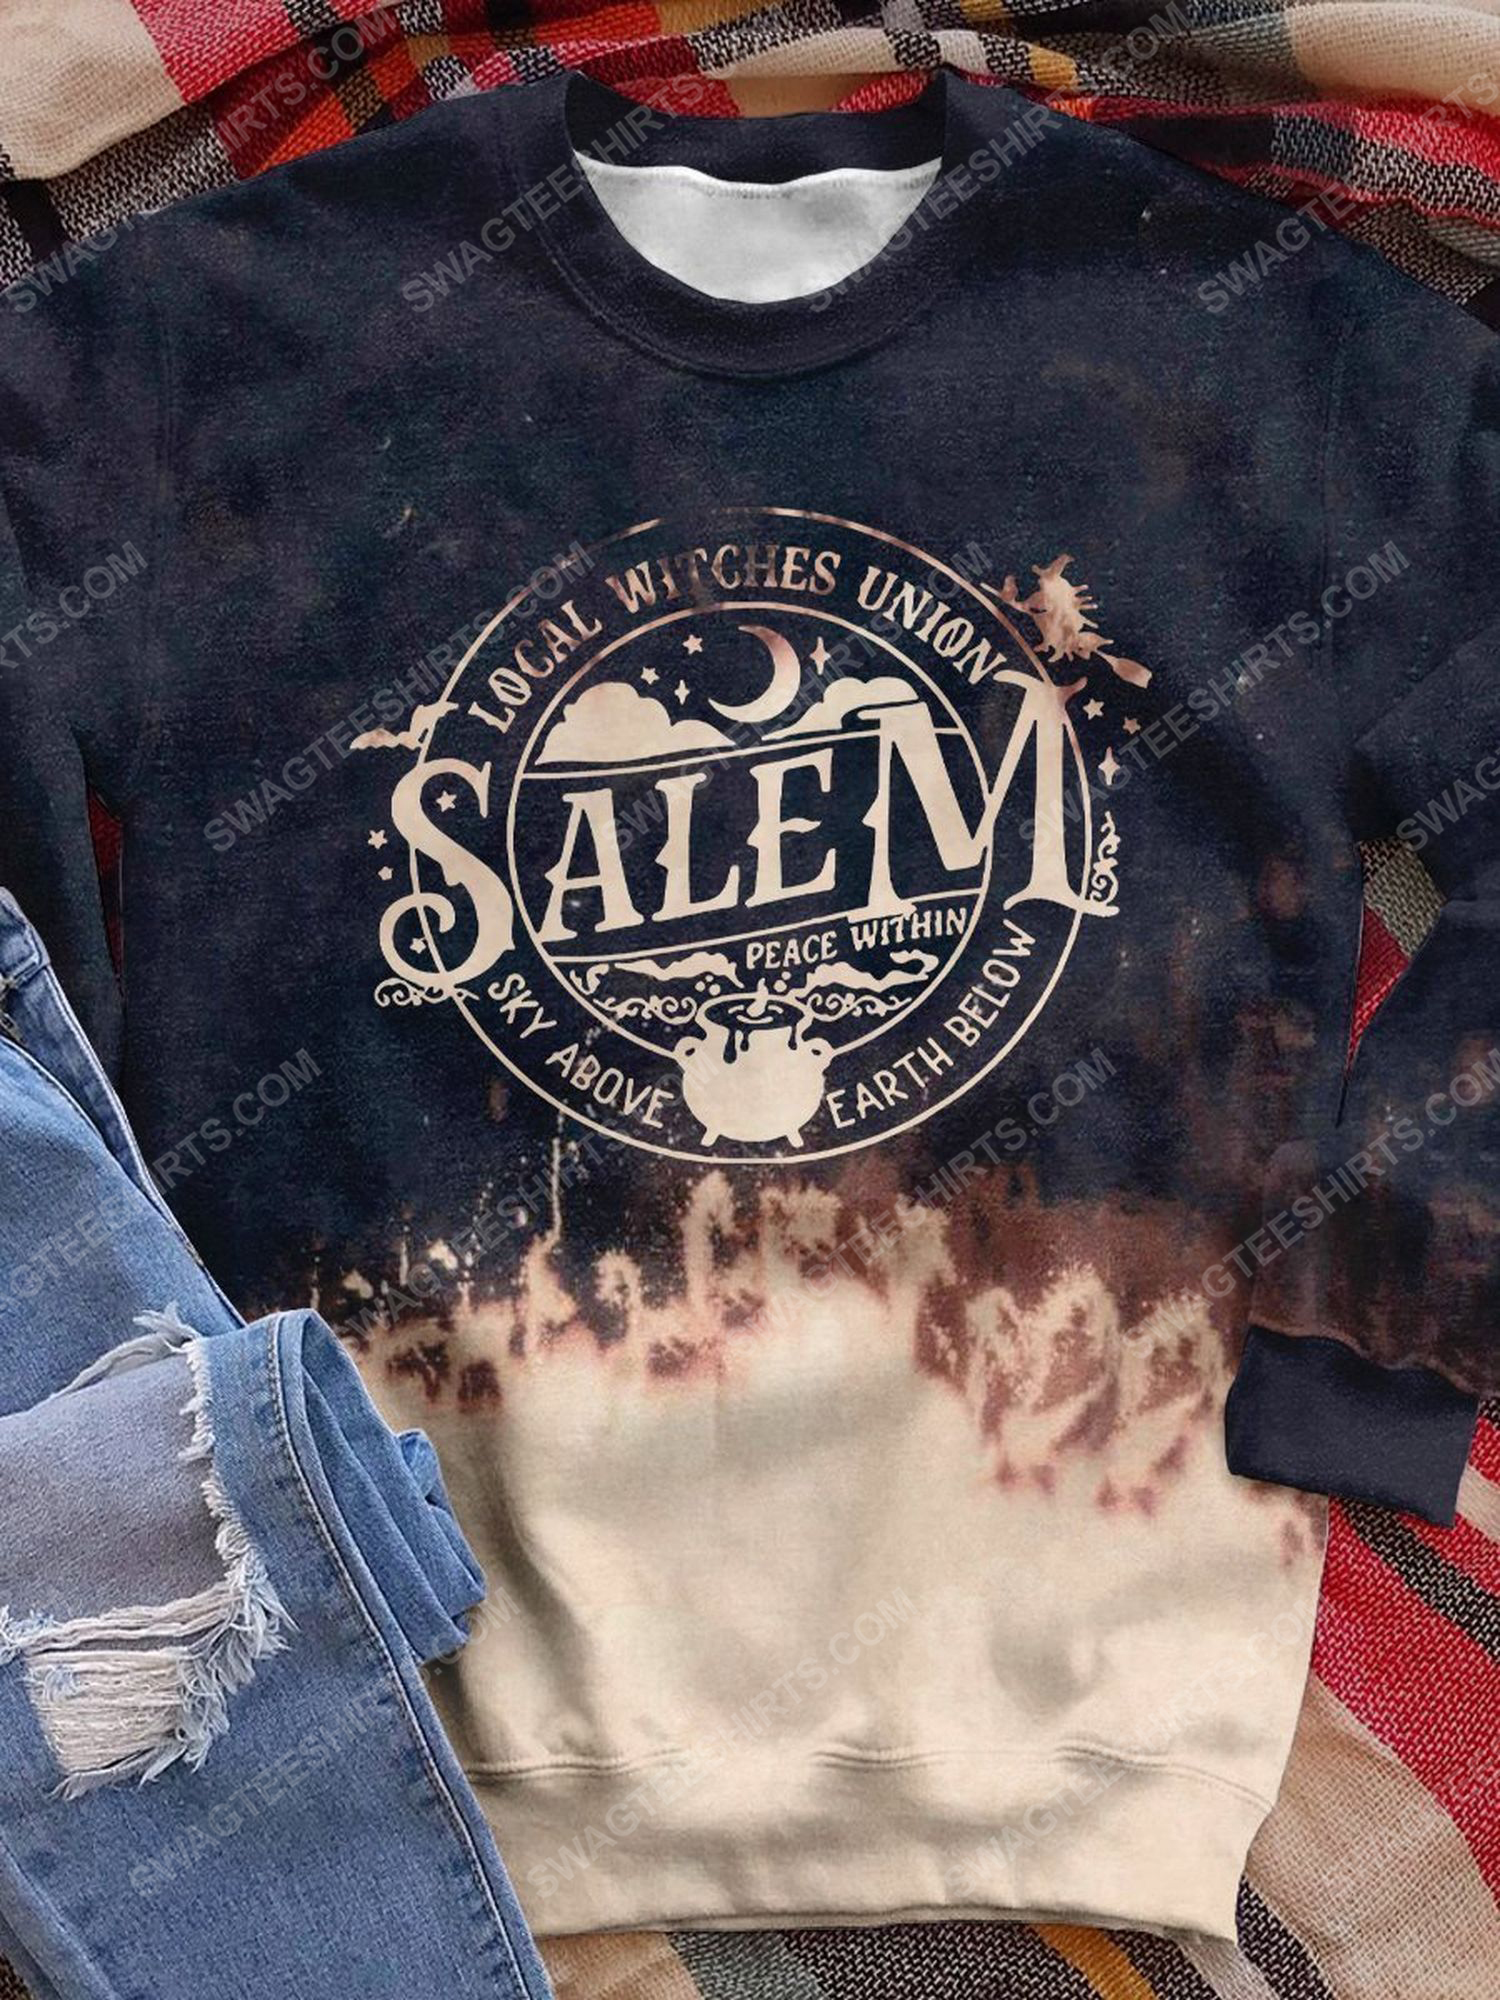 Halloween night local witches union salem shirt 1 - Copy